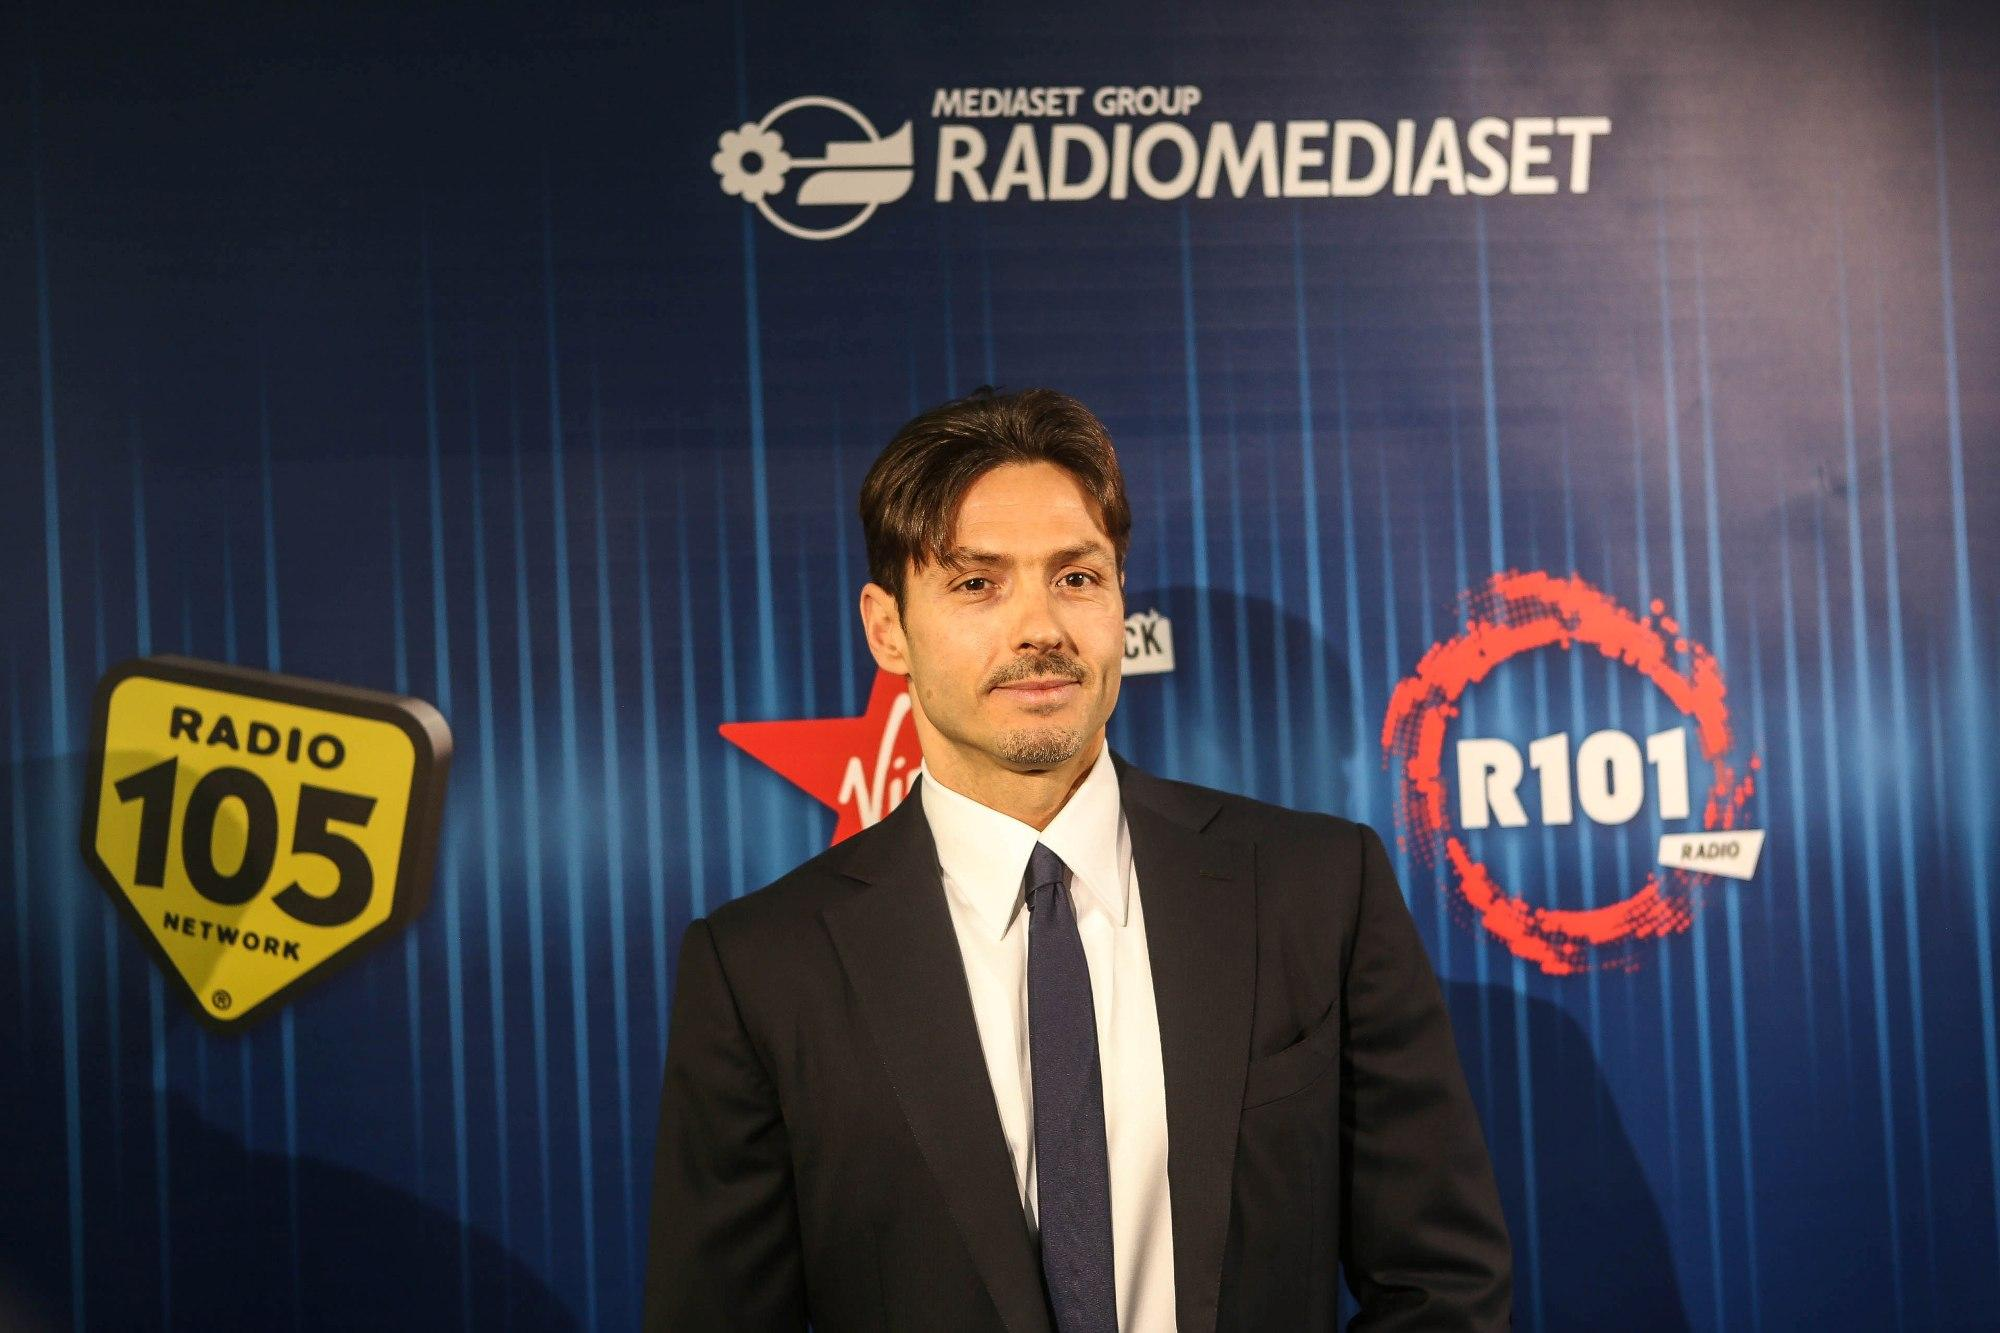 Radiomediaset , presentato a Milano il nuovo polo radiofonico